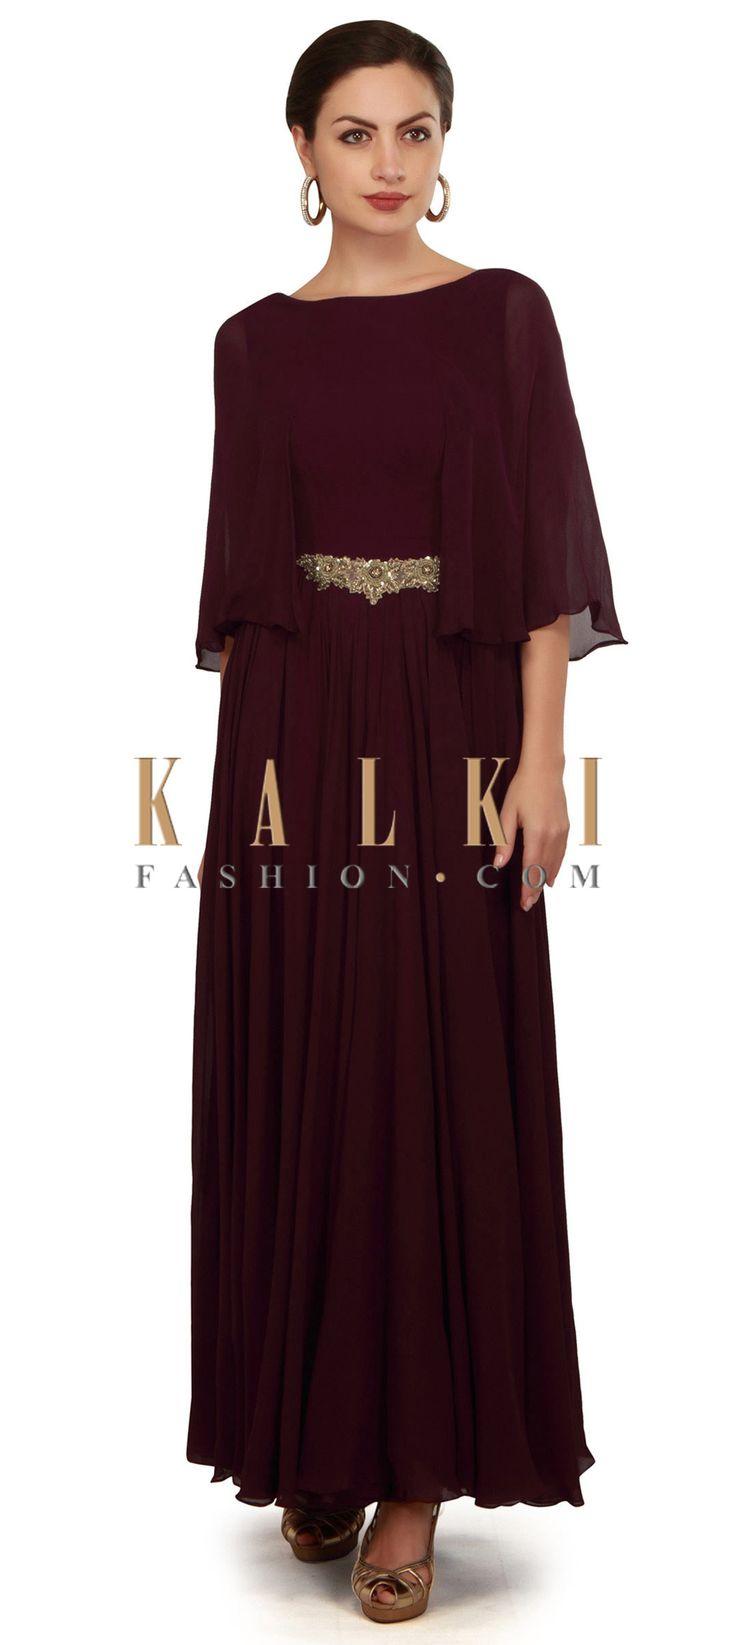 Brown dress featuring in fancy sleeve only on Kalki